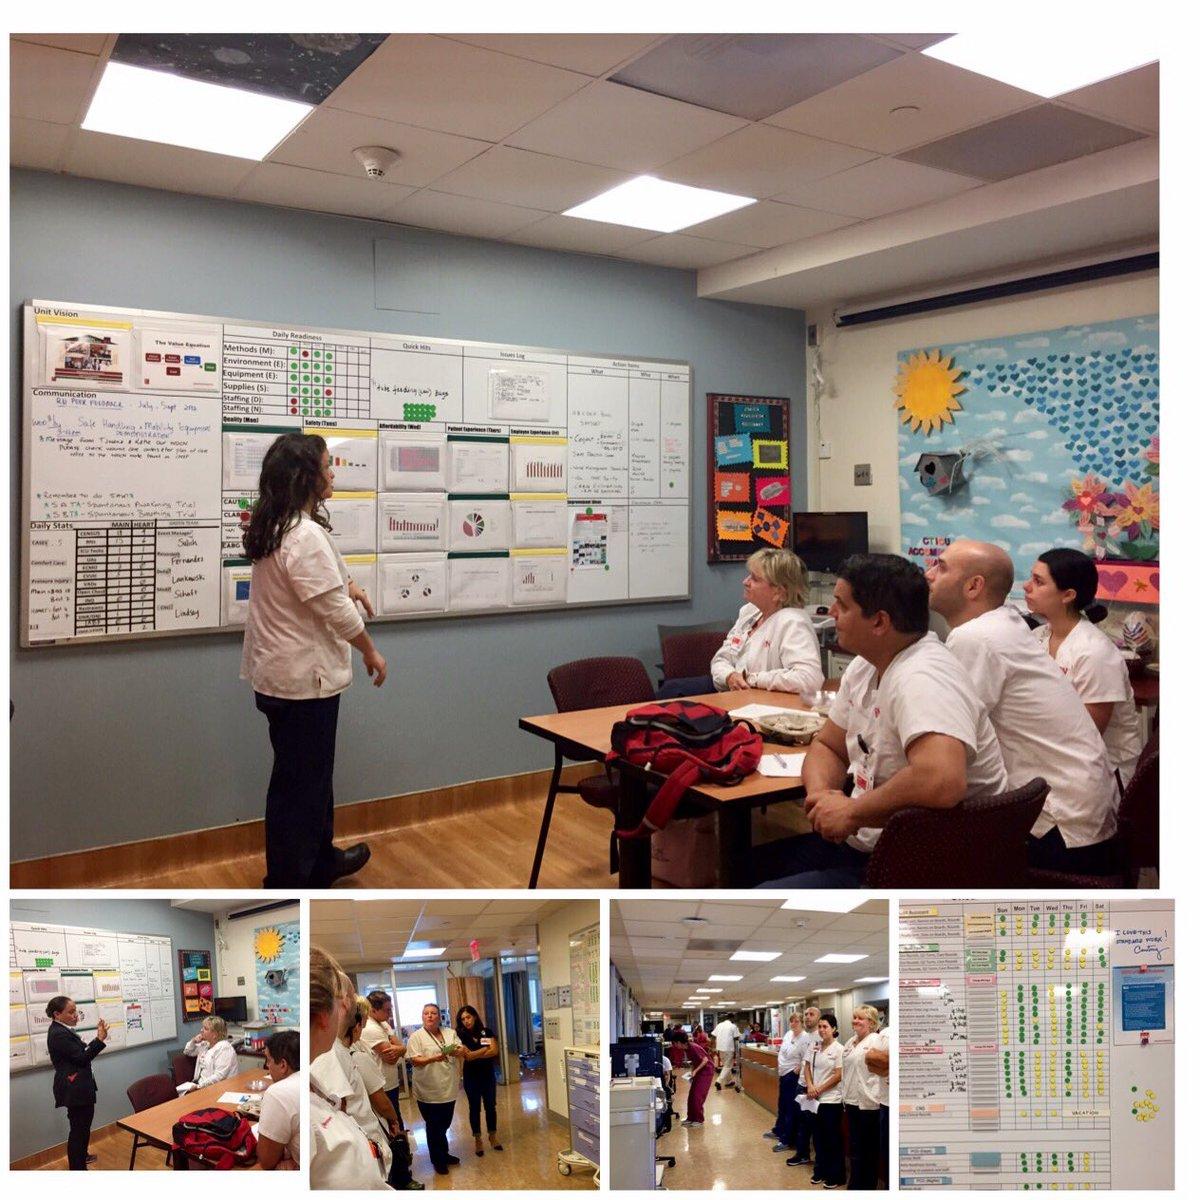 Learning &amp; sharing standard work @CTICU_NYC @AllinatTheAllen @HeadRNColumbia @QualityRN_NYP #Visibility Board #kamishibai board # #lean #CI<br>http://pic.twitter.com/sUybqiEWJL